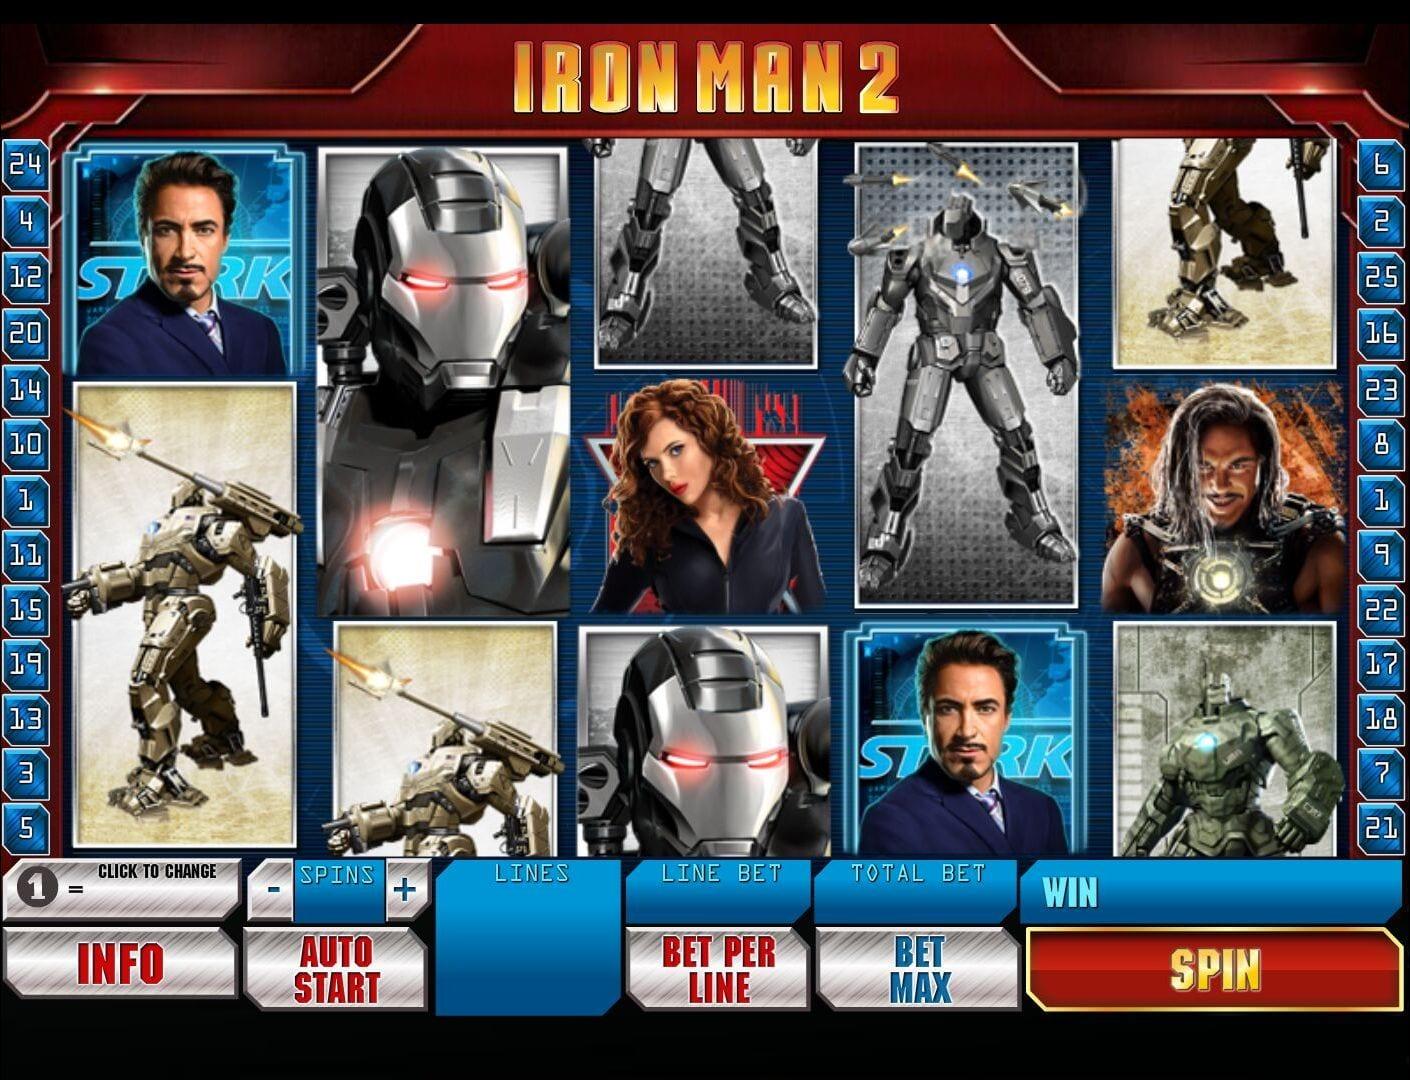 Iron Man 2 Free Online Slot